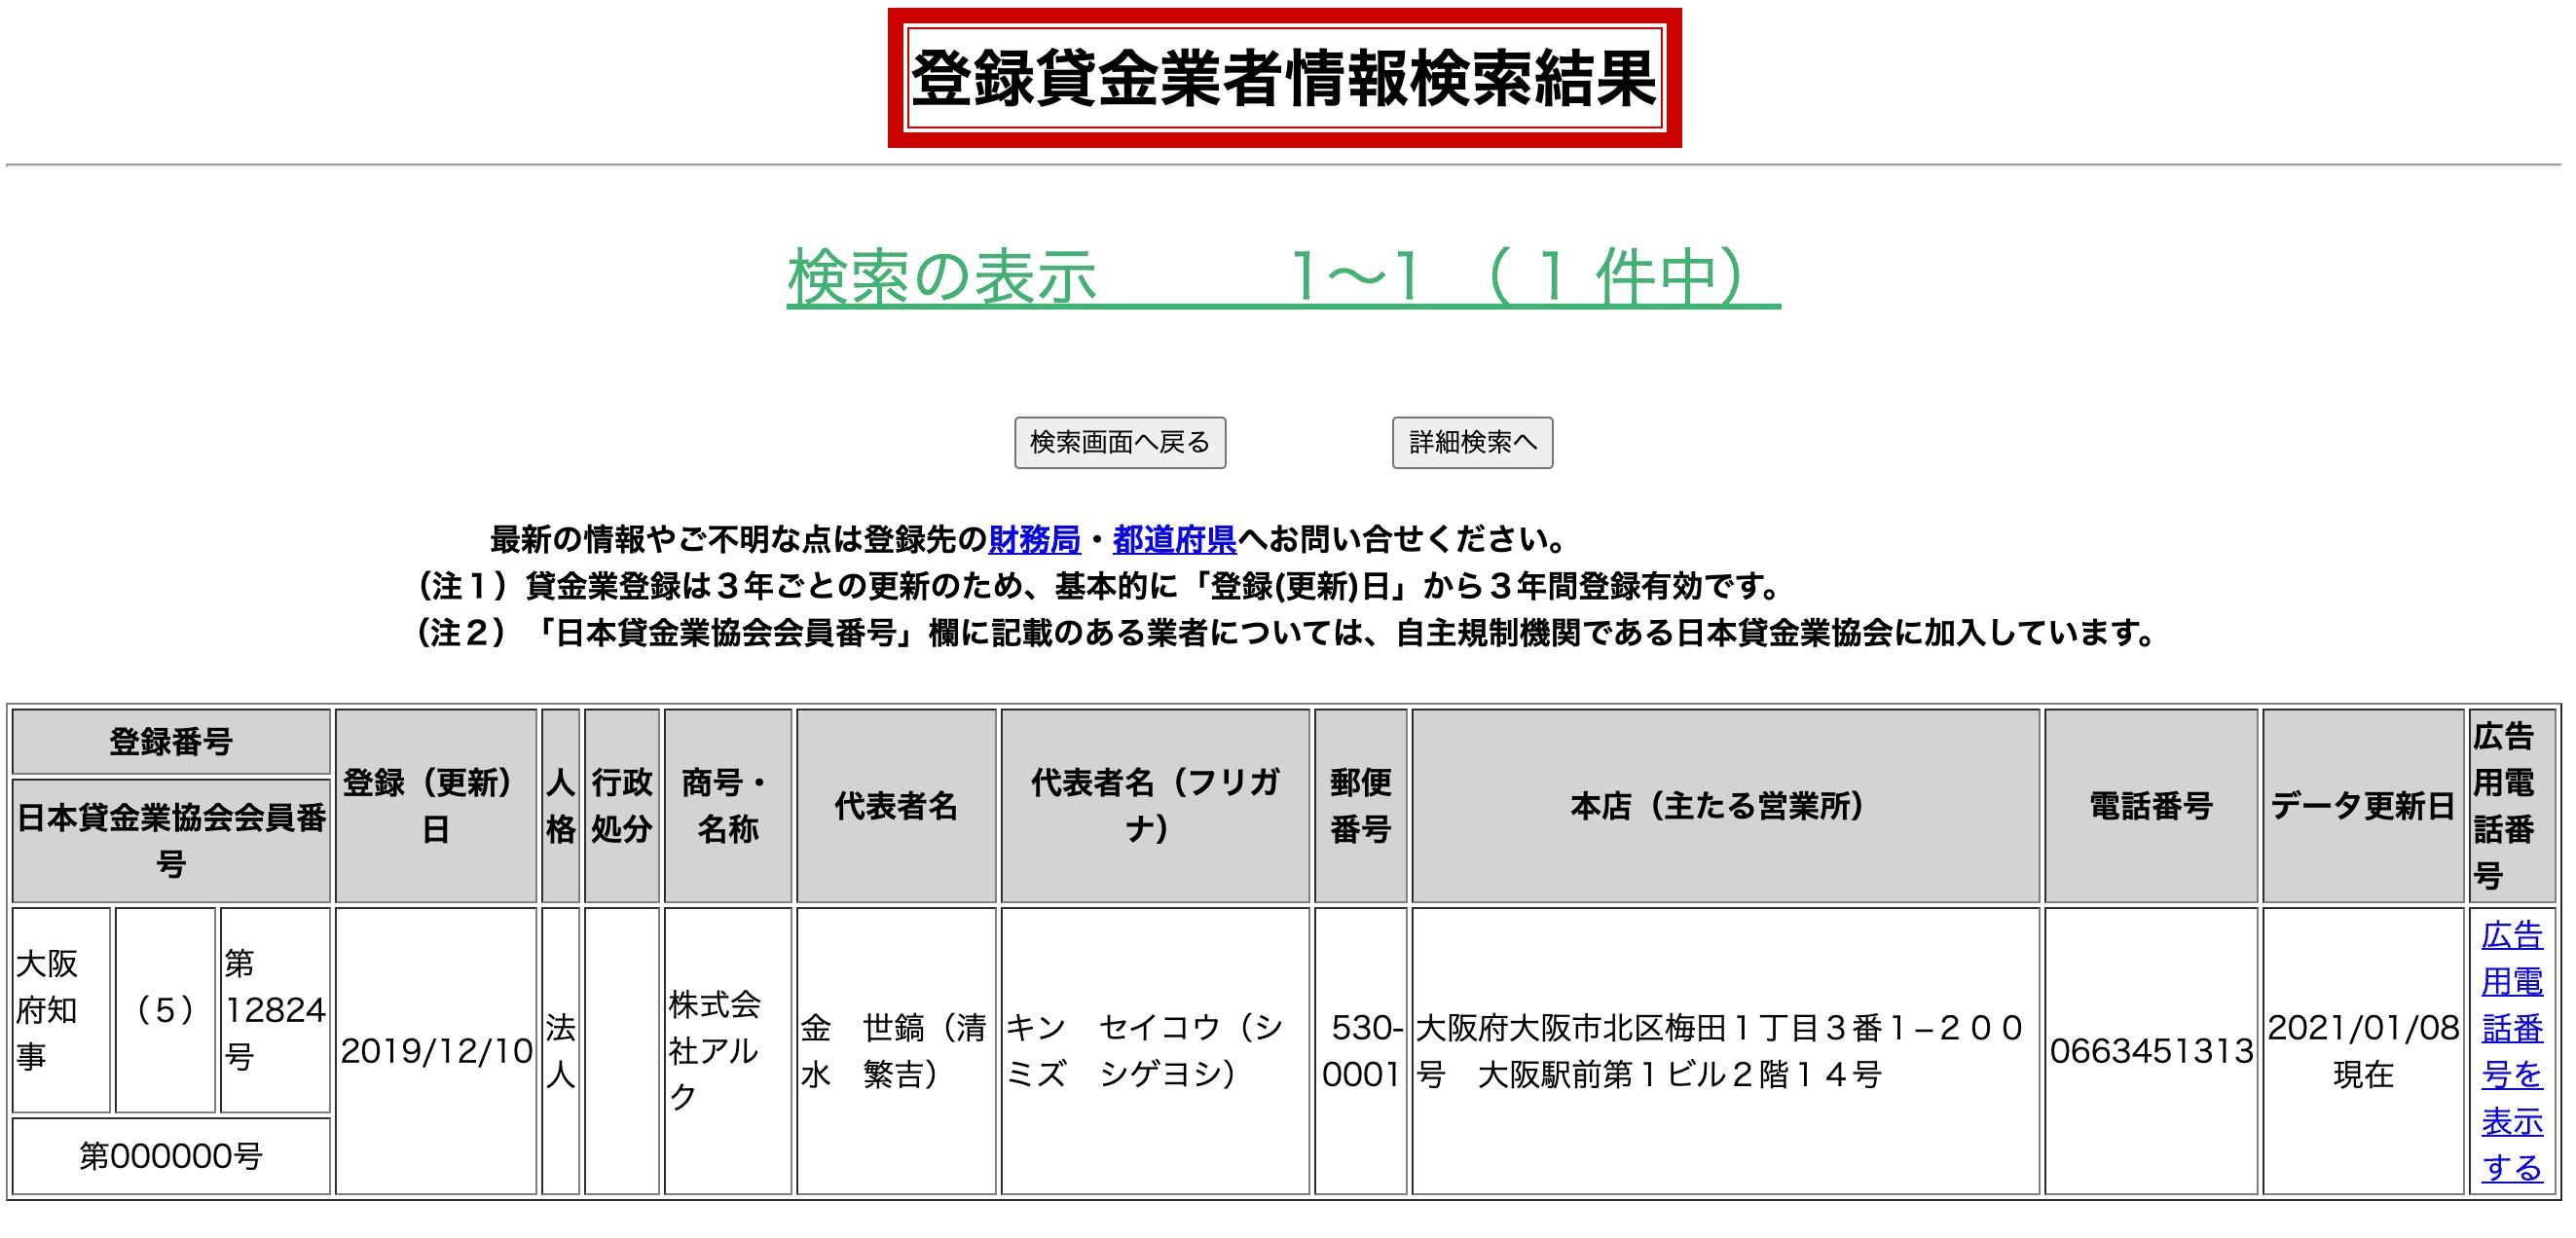 株式会社アルク(登録貸金業者情報検索結果)